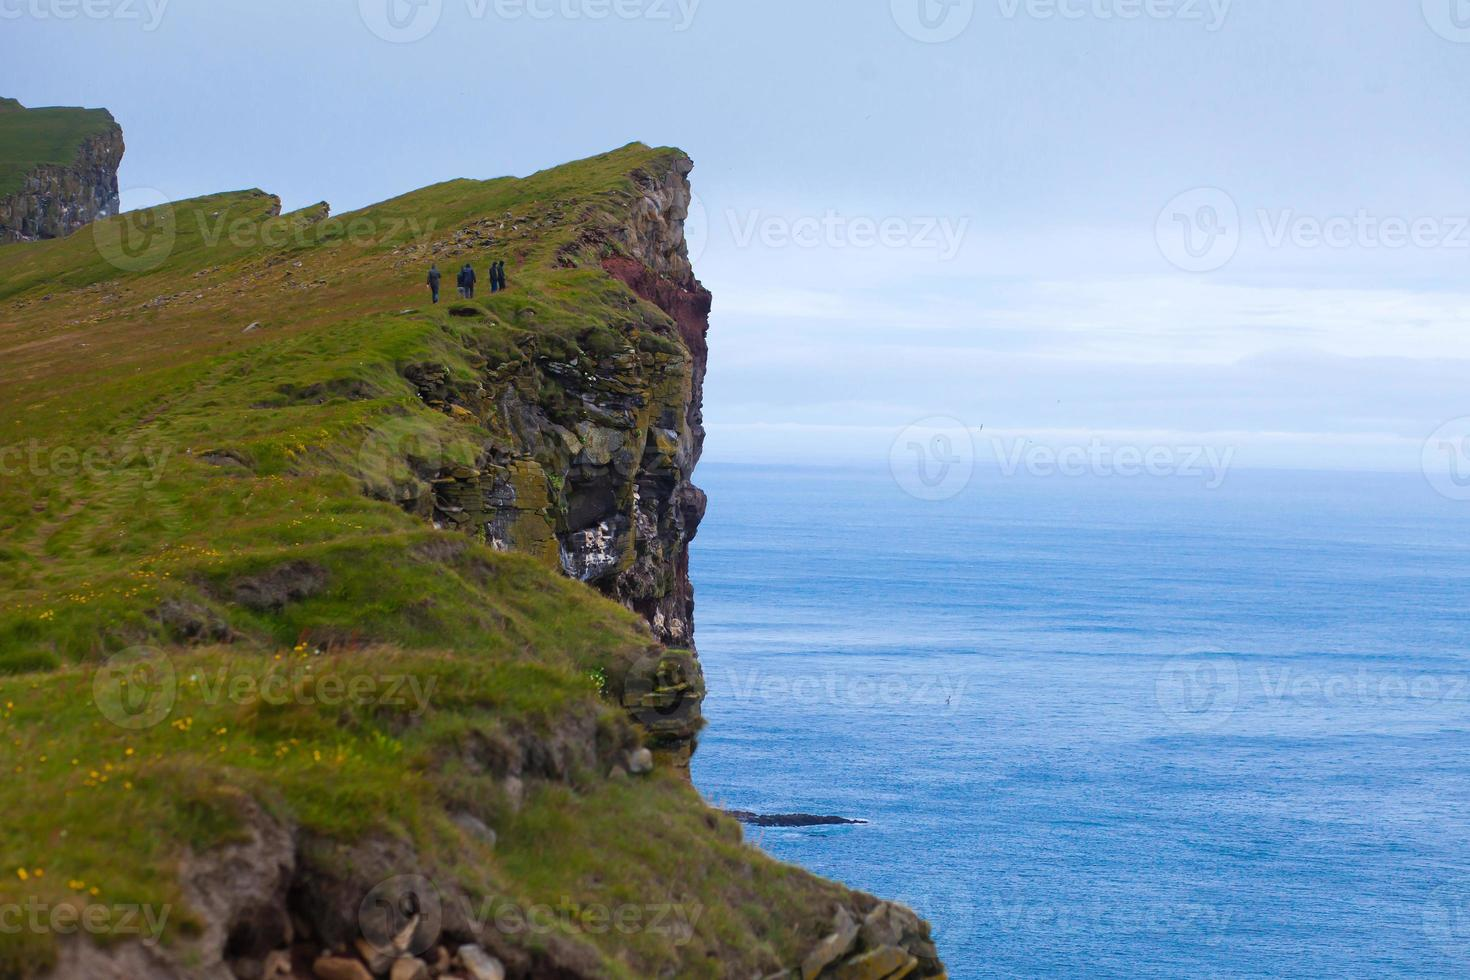 capa latrabjarg, vestfirdir, islândia, borda do mundo foto